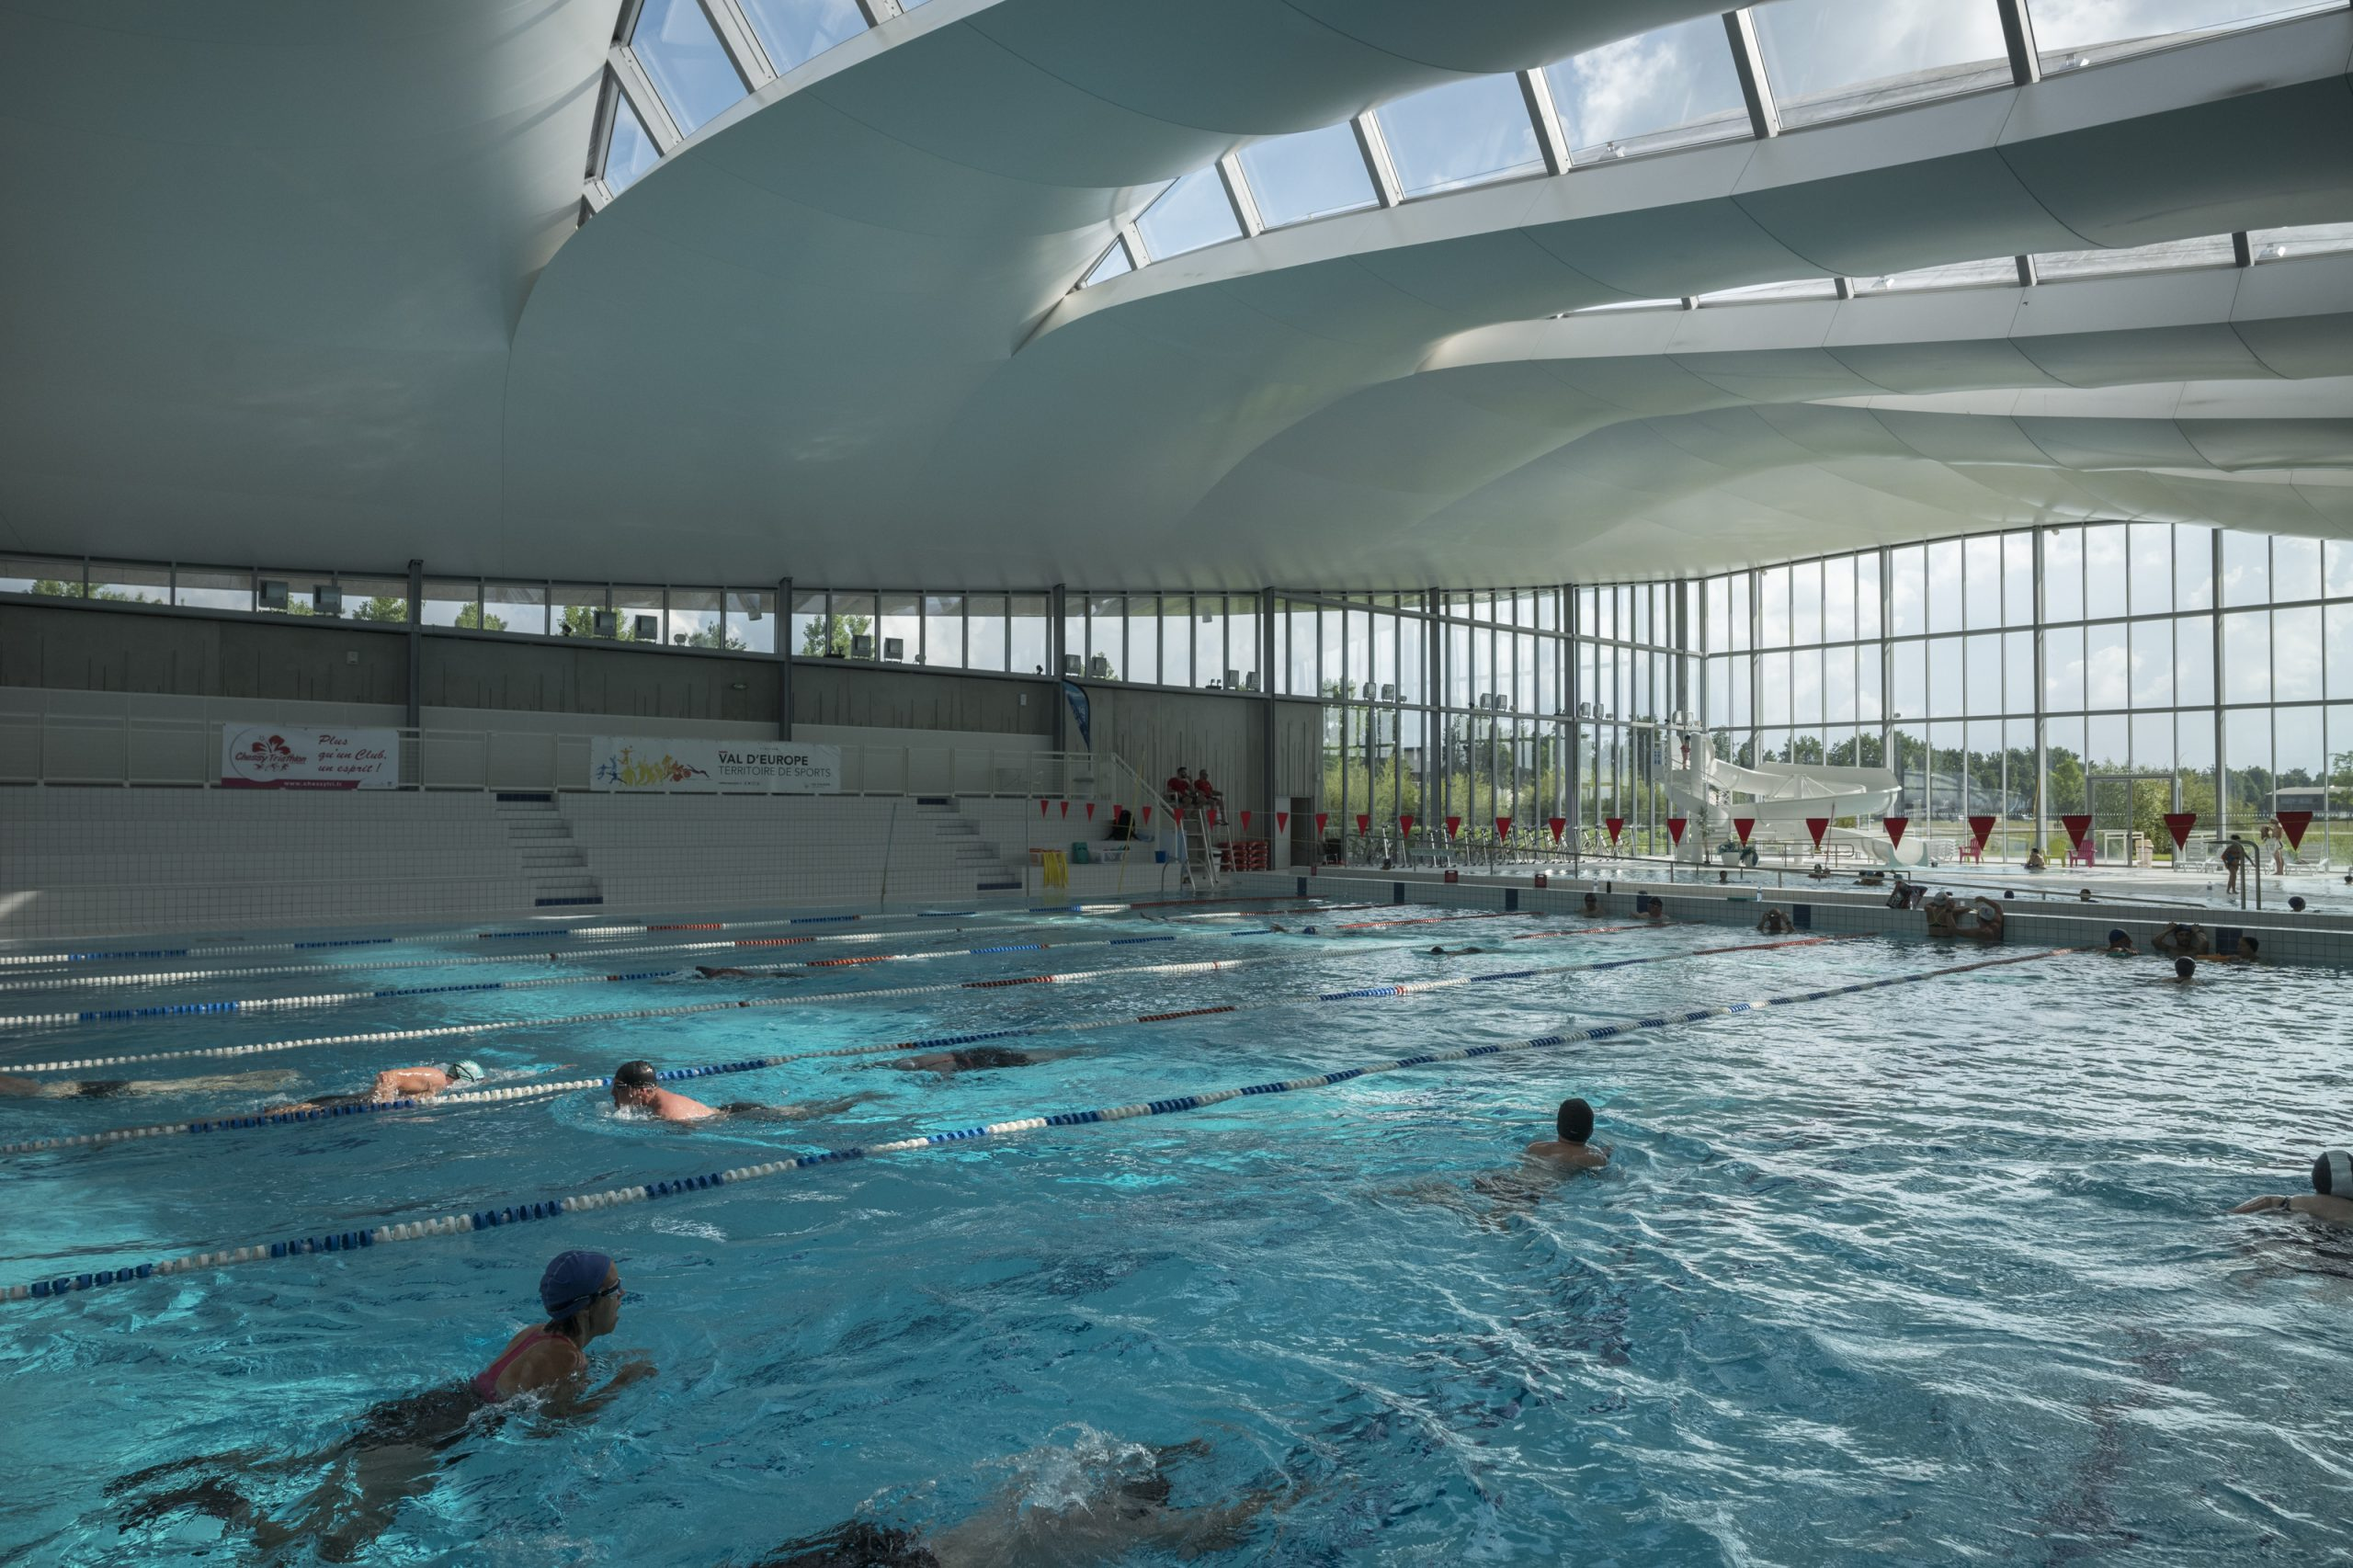 Centre Aquatique De Val D'europe - Bailly Romainvilliers dedans Piscine Serris